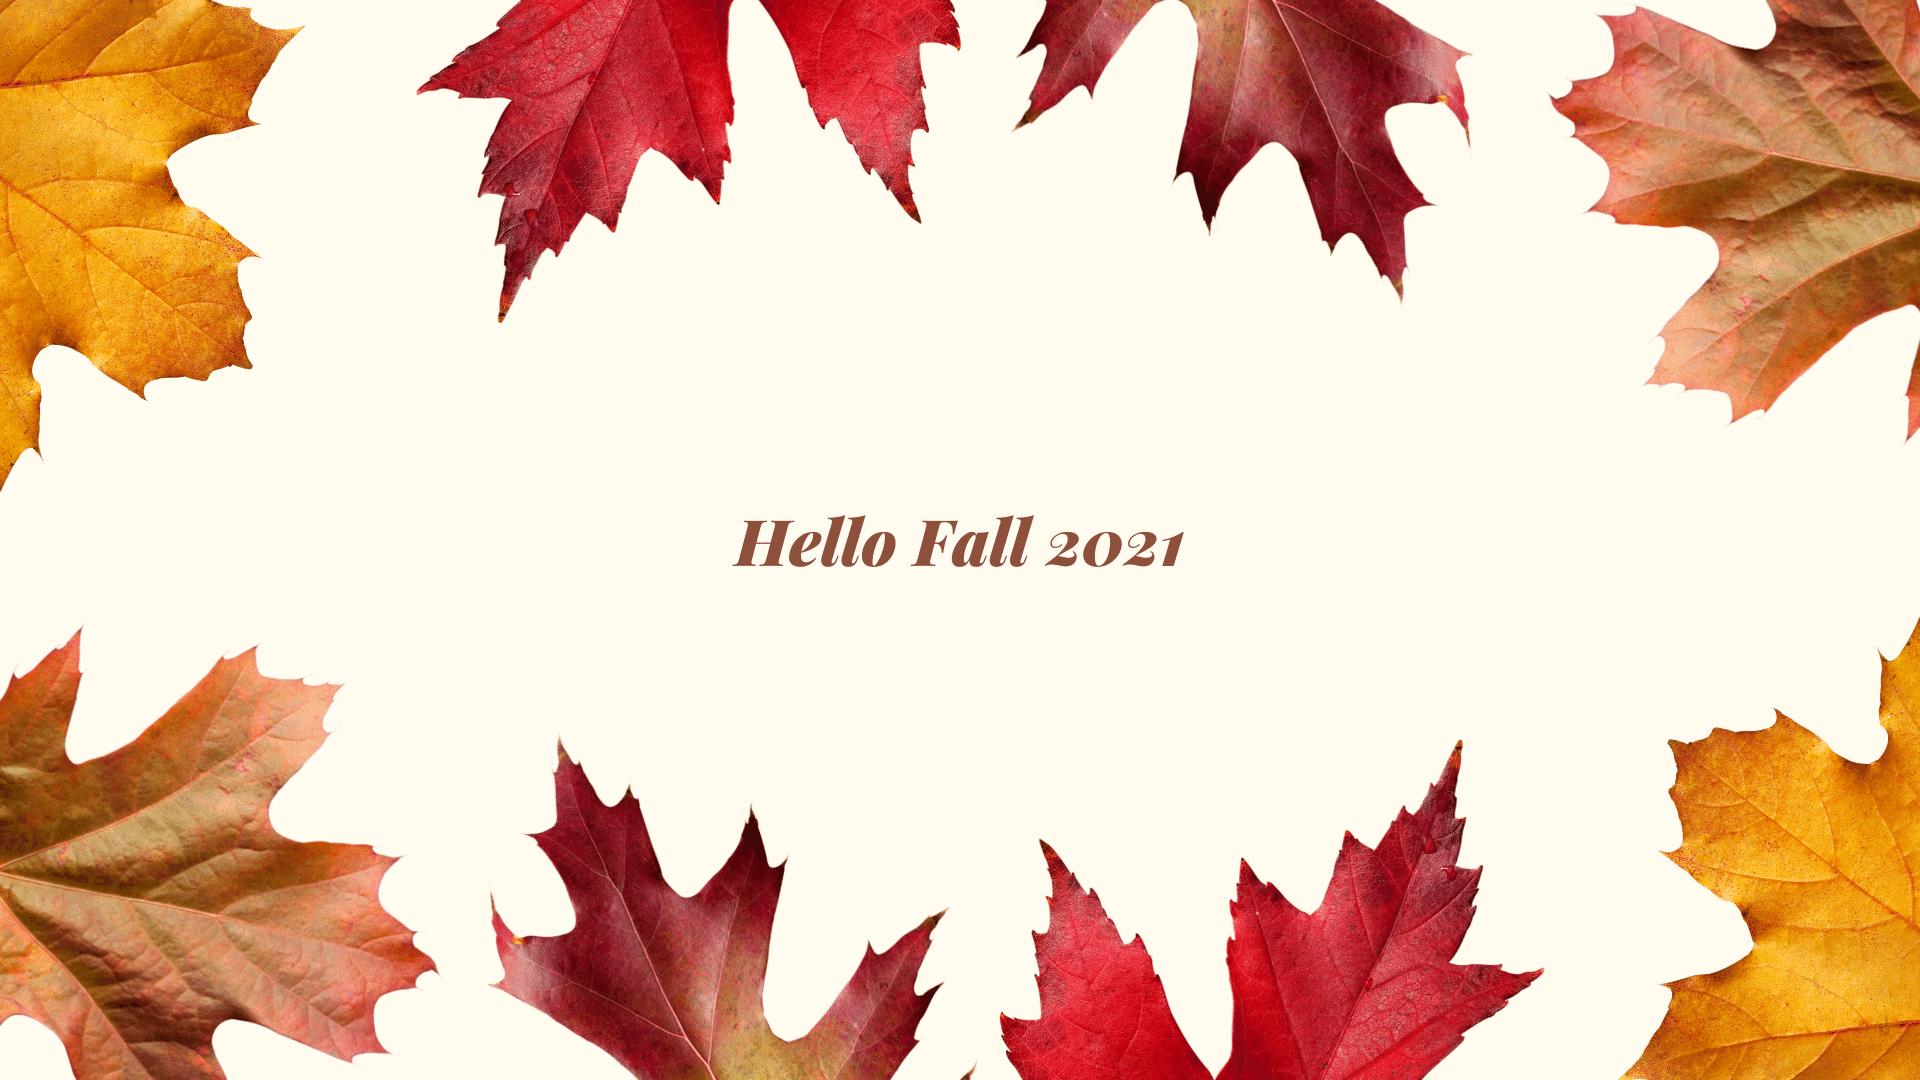 Best Fall 2021 Wallpapers HD download for desktop 1920x1080